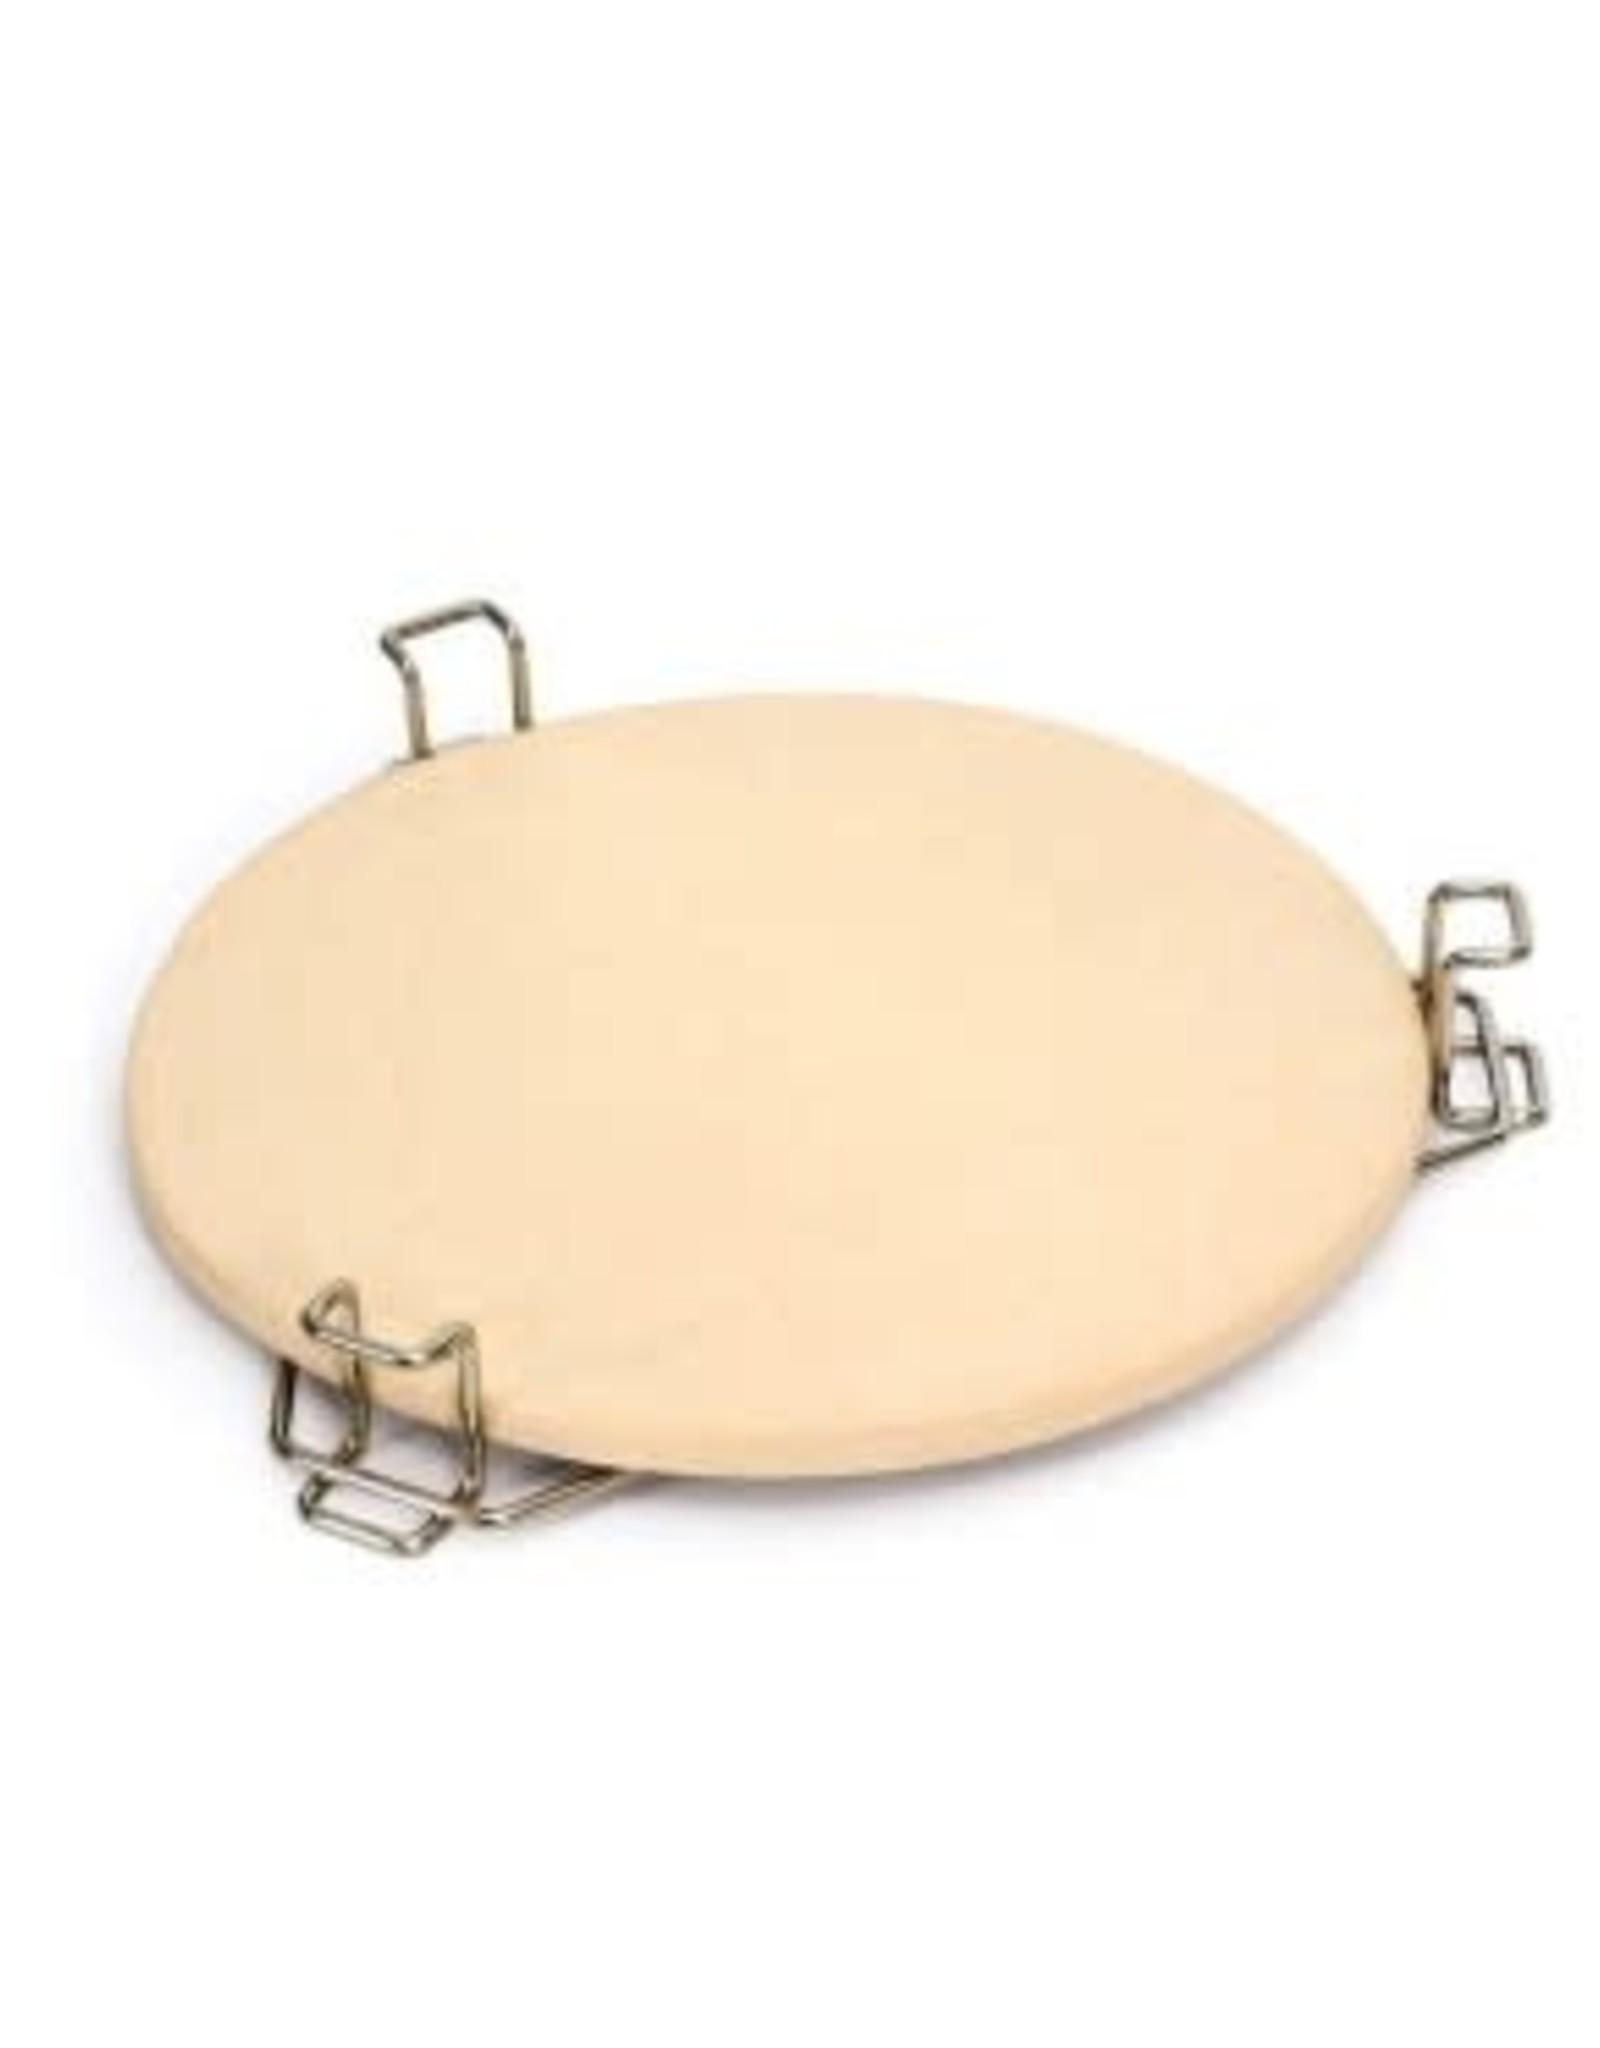 Primo Ceramic Grills Primo Ceramic Heat Deflector Plate for Round LG 280 #349